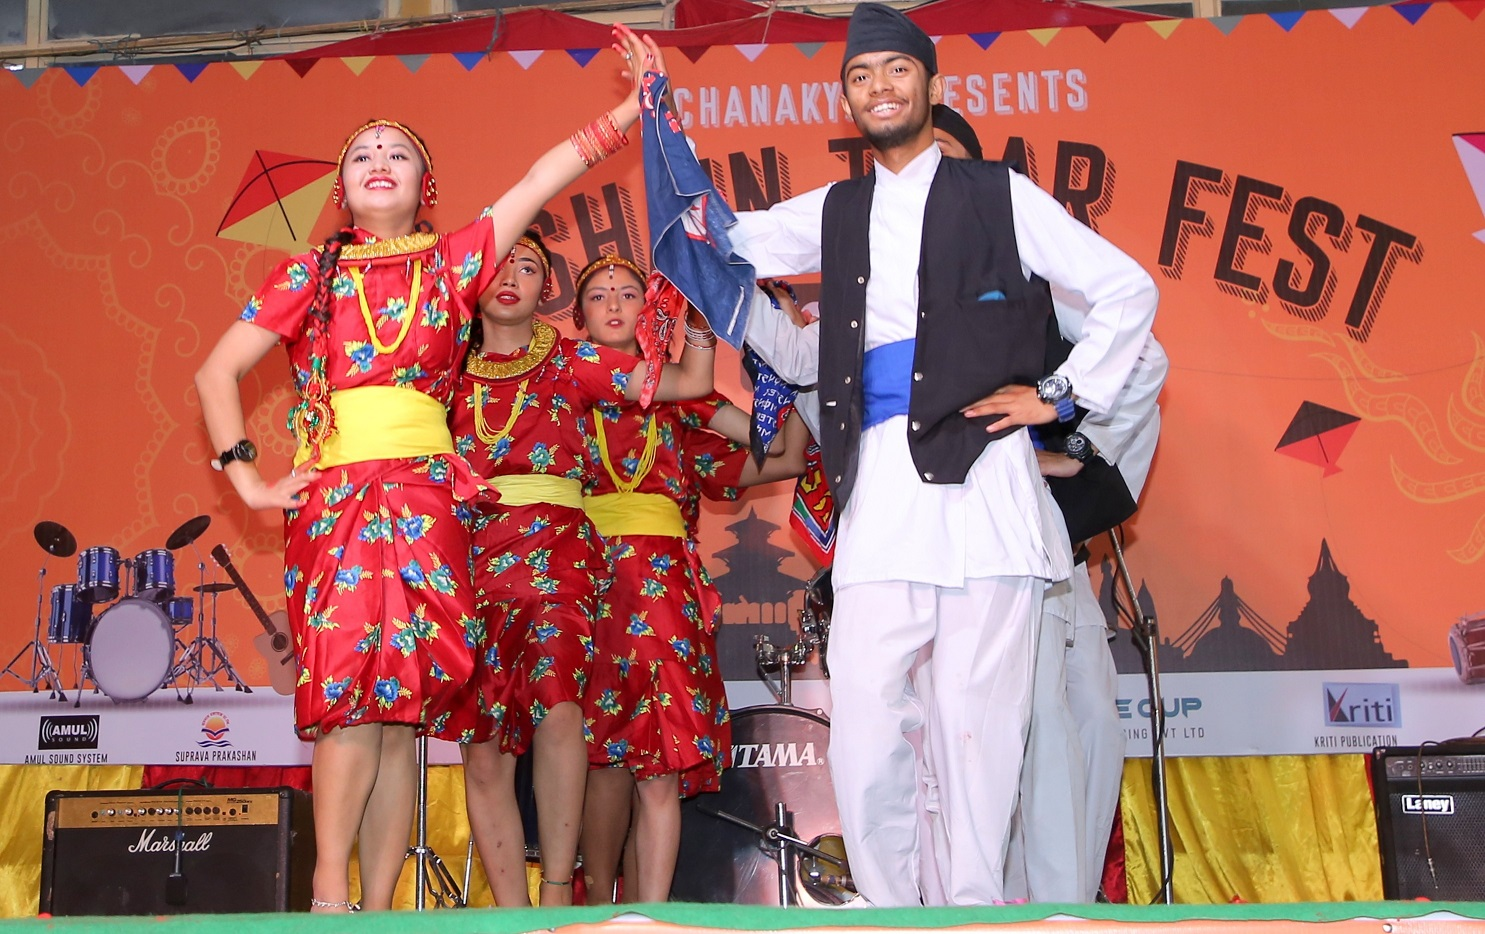 Dashain & Tihar Fest